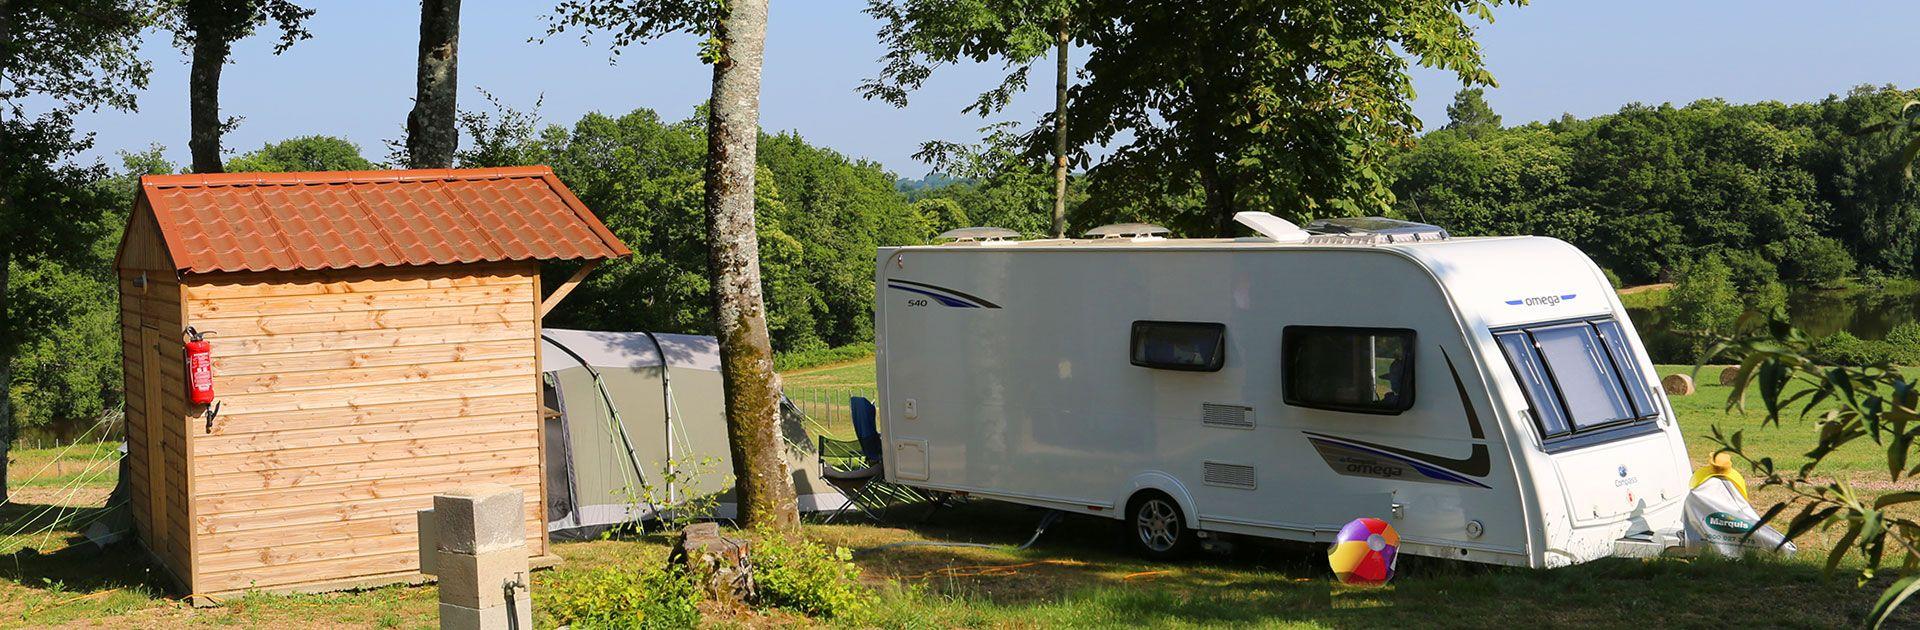 Sanitaire Individuel Camping Périgord Dordogne